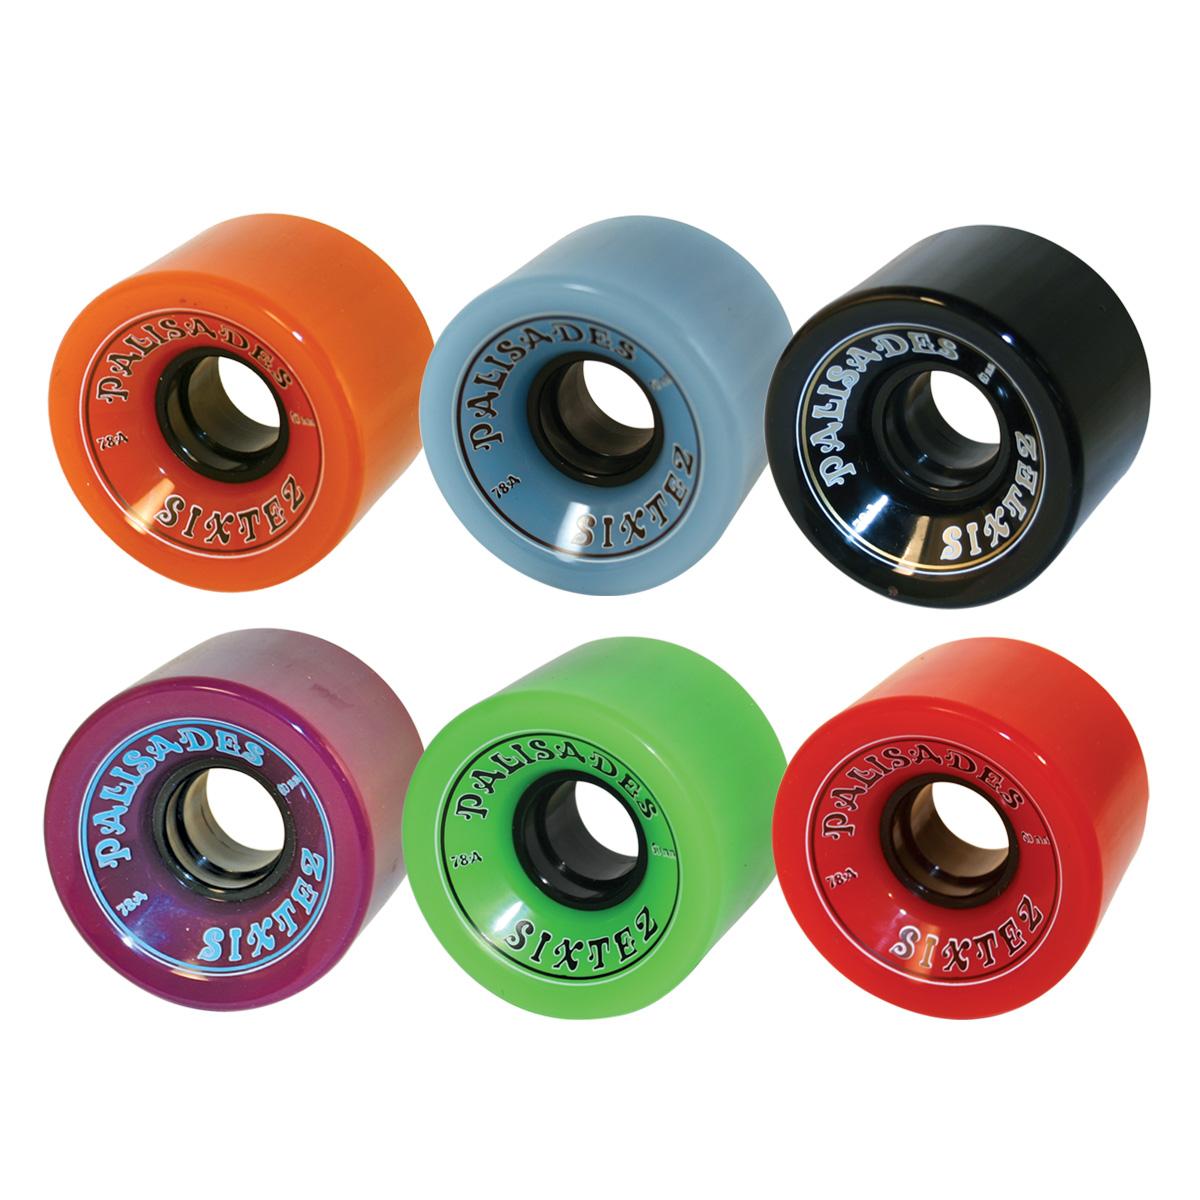 Sixtez - 60mm Wheels  78A w/hub. Orange, Blue, Black, Purple, Green, Red